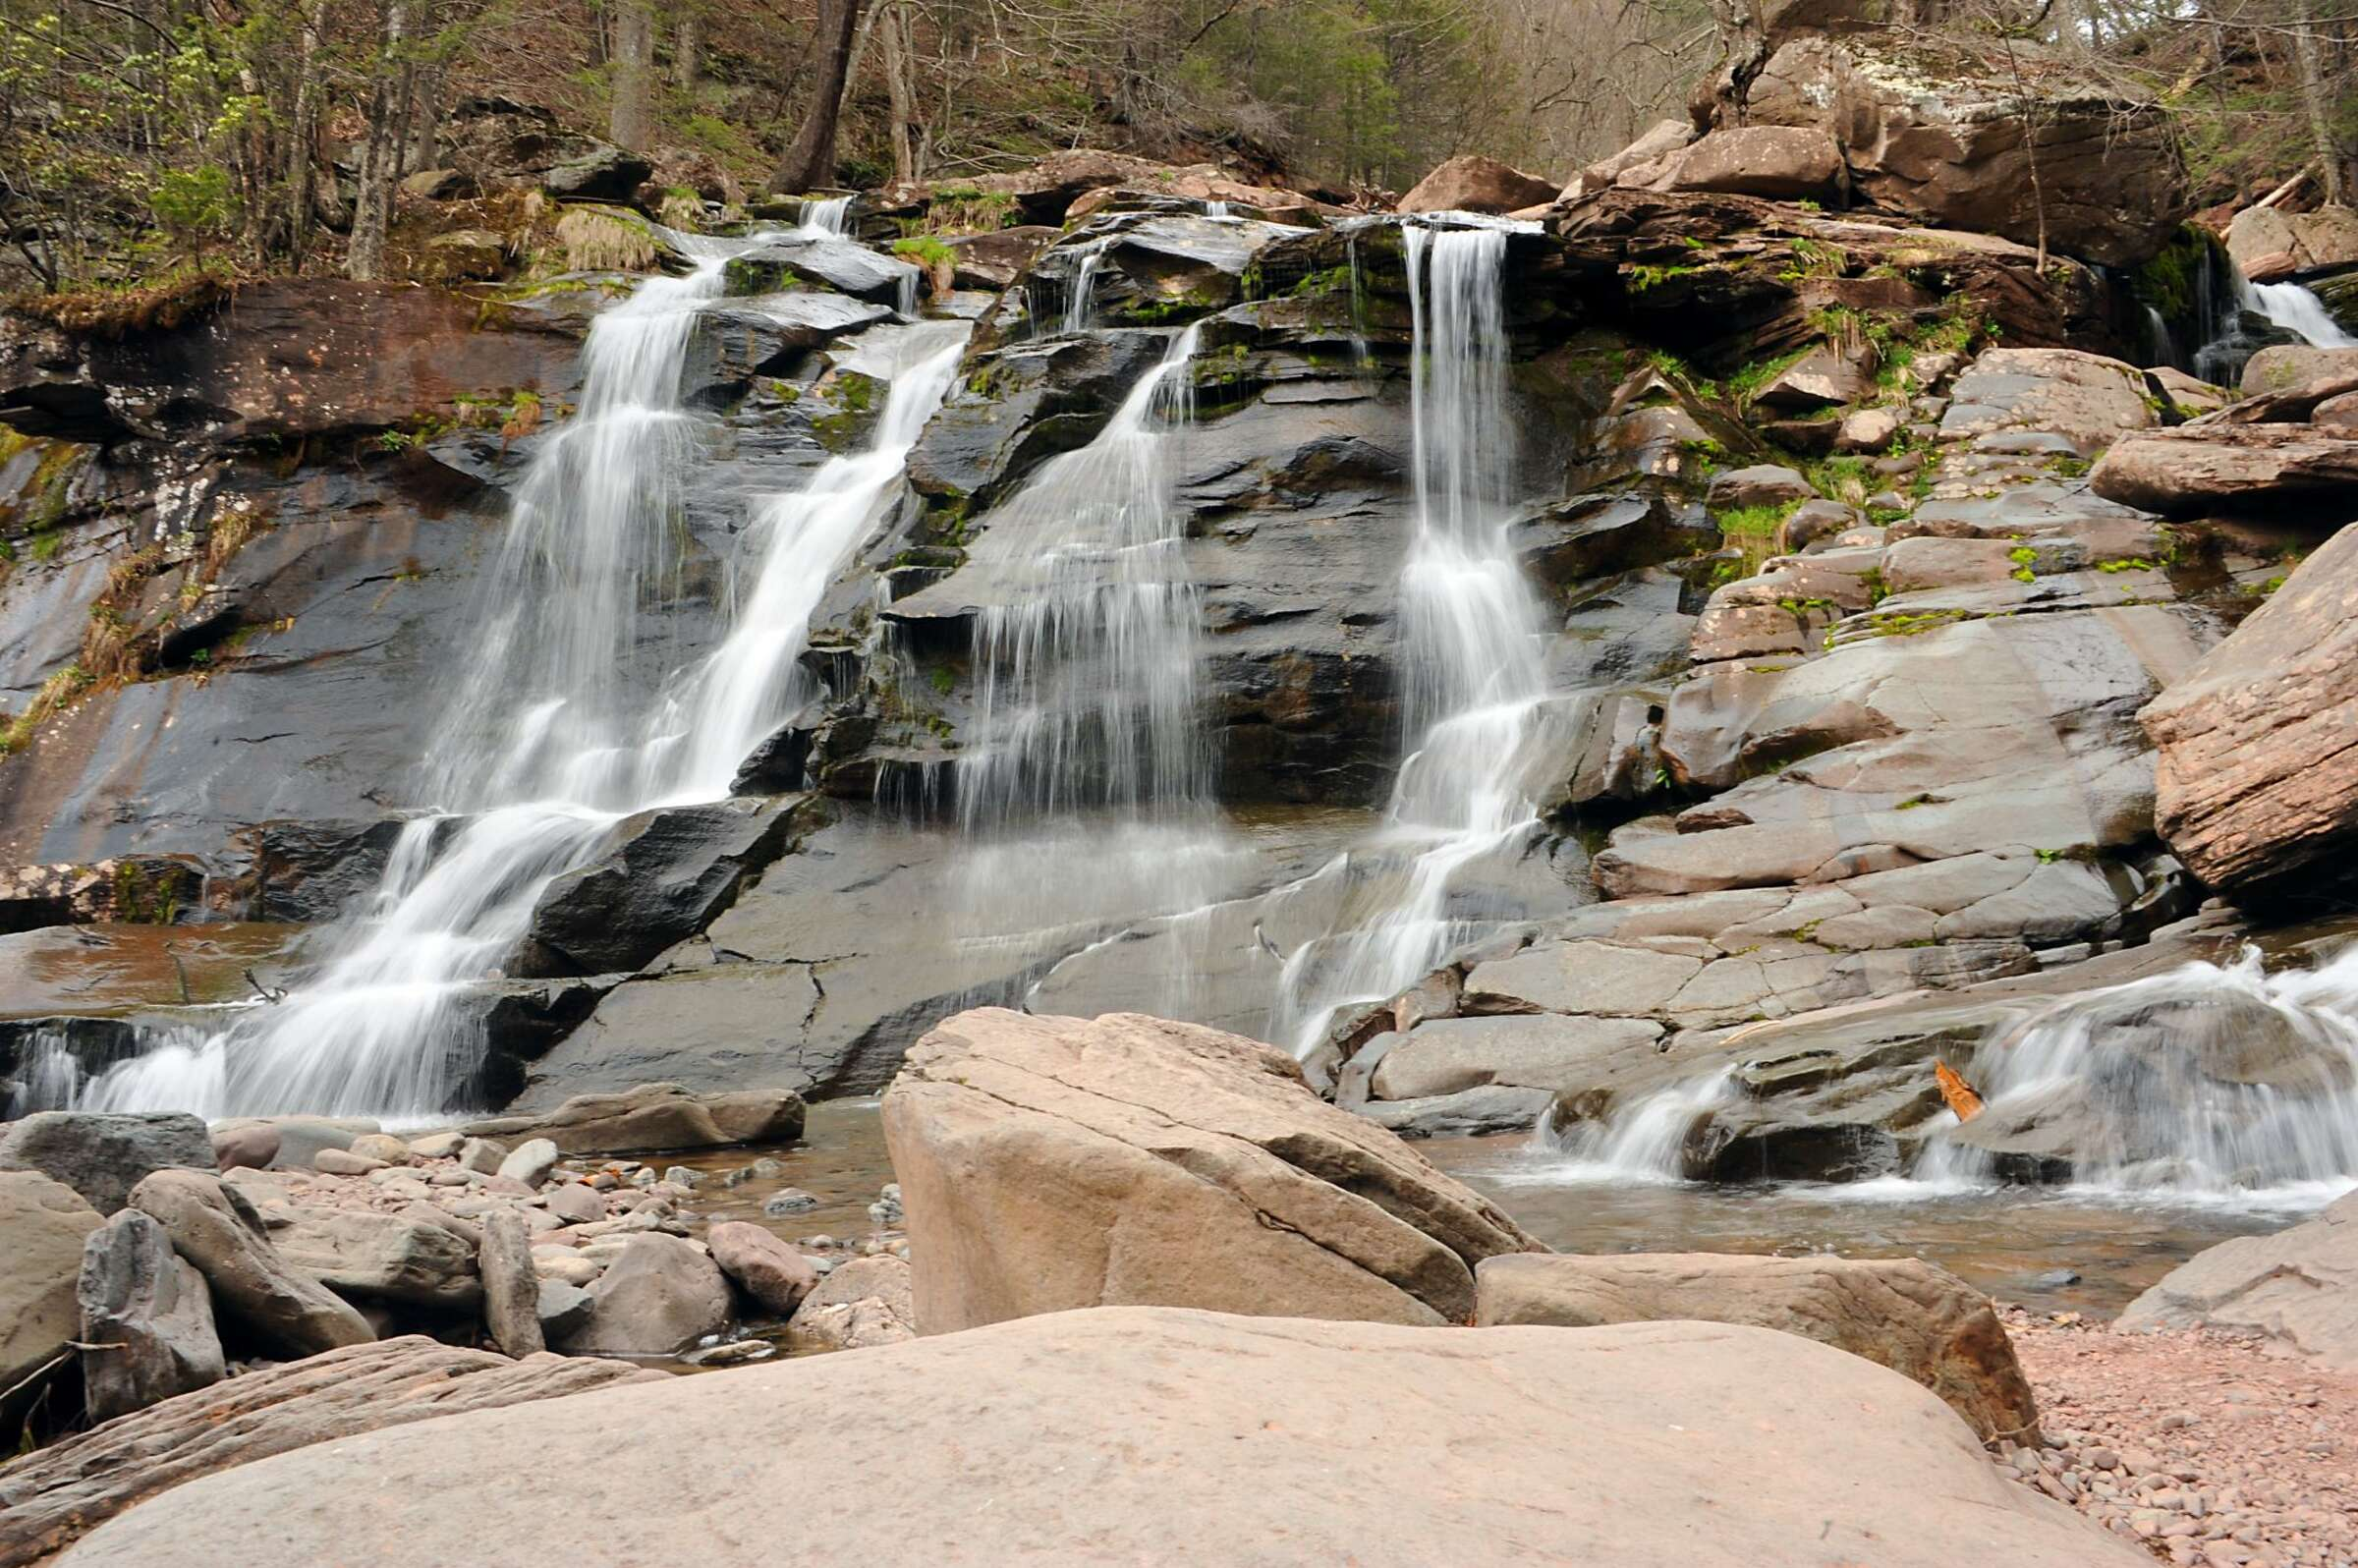 The 10 best waterfall hikes near the Capital Region